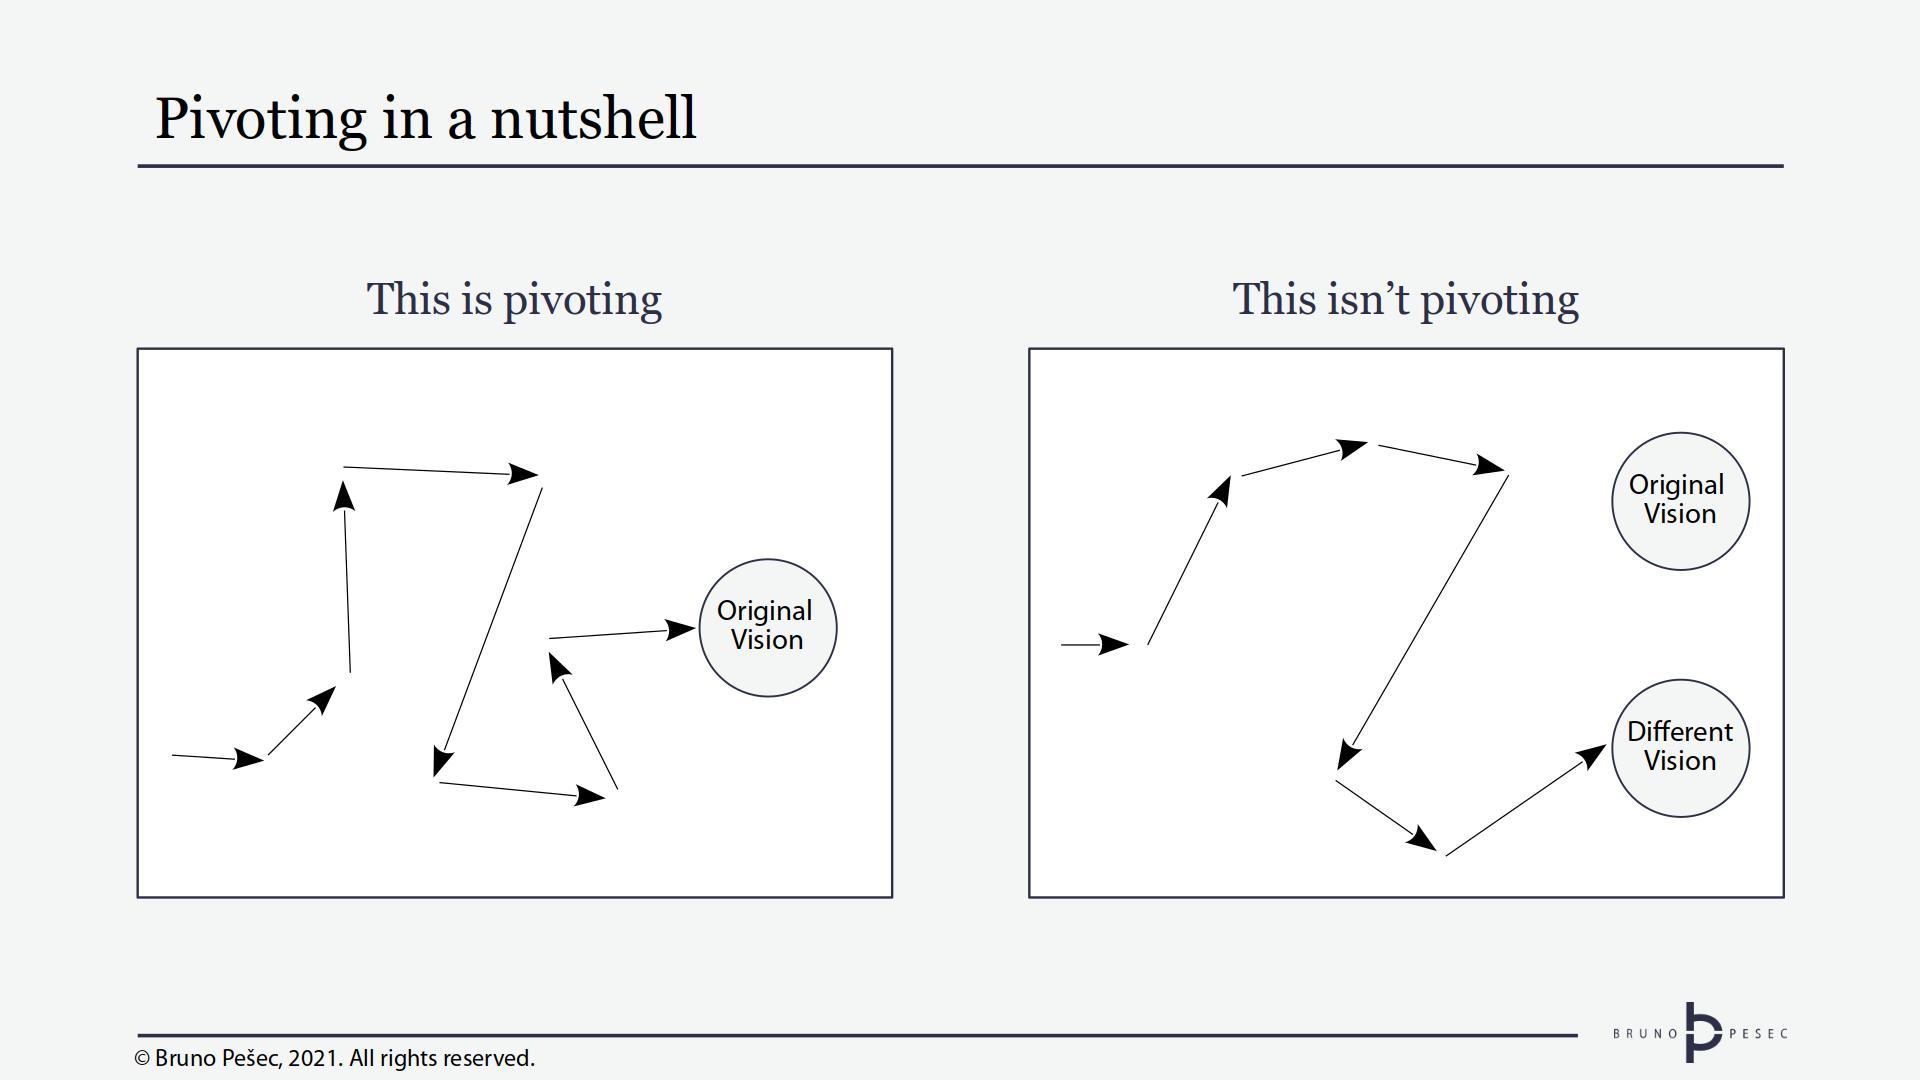 Pivoting in a nutshell. © Bruno Pešec, 2021.